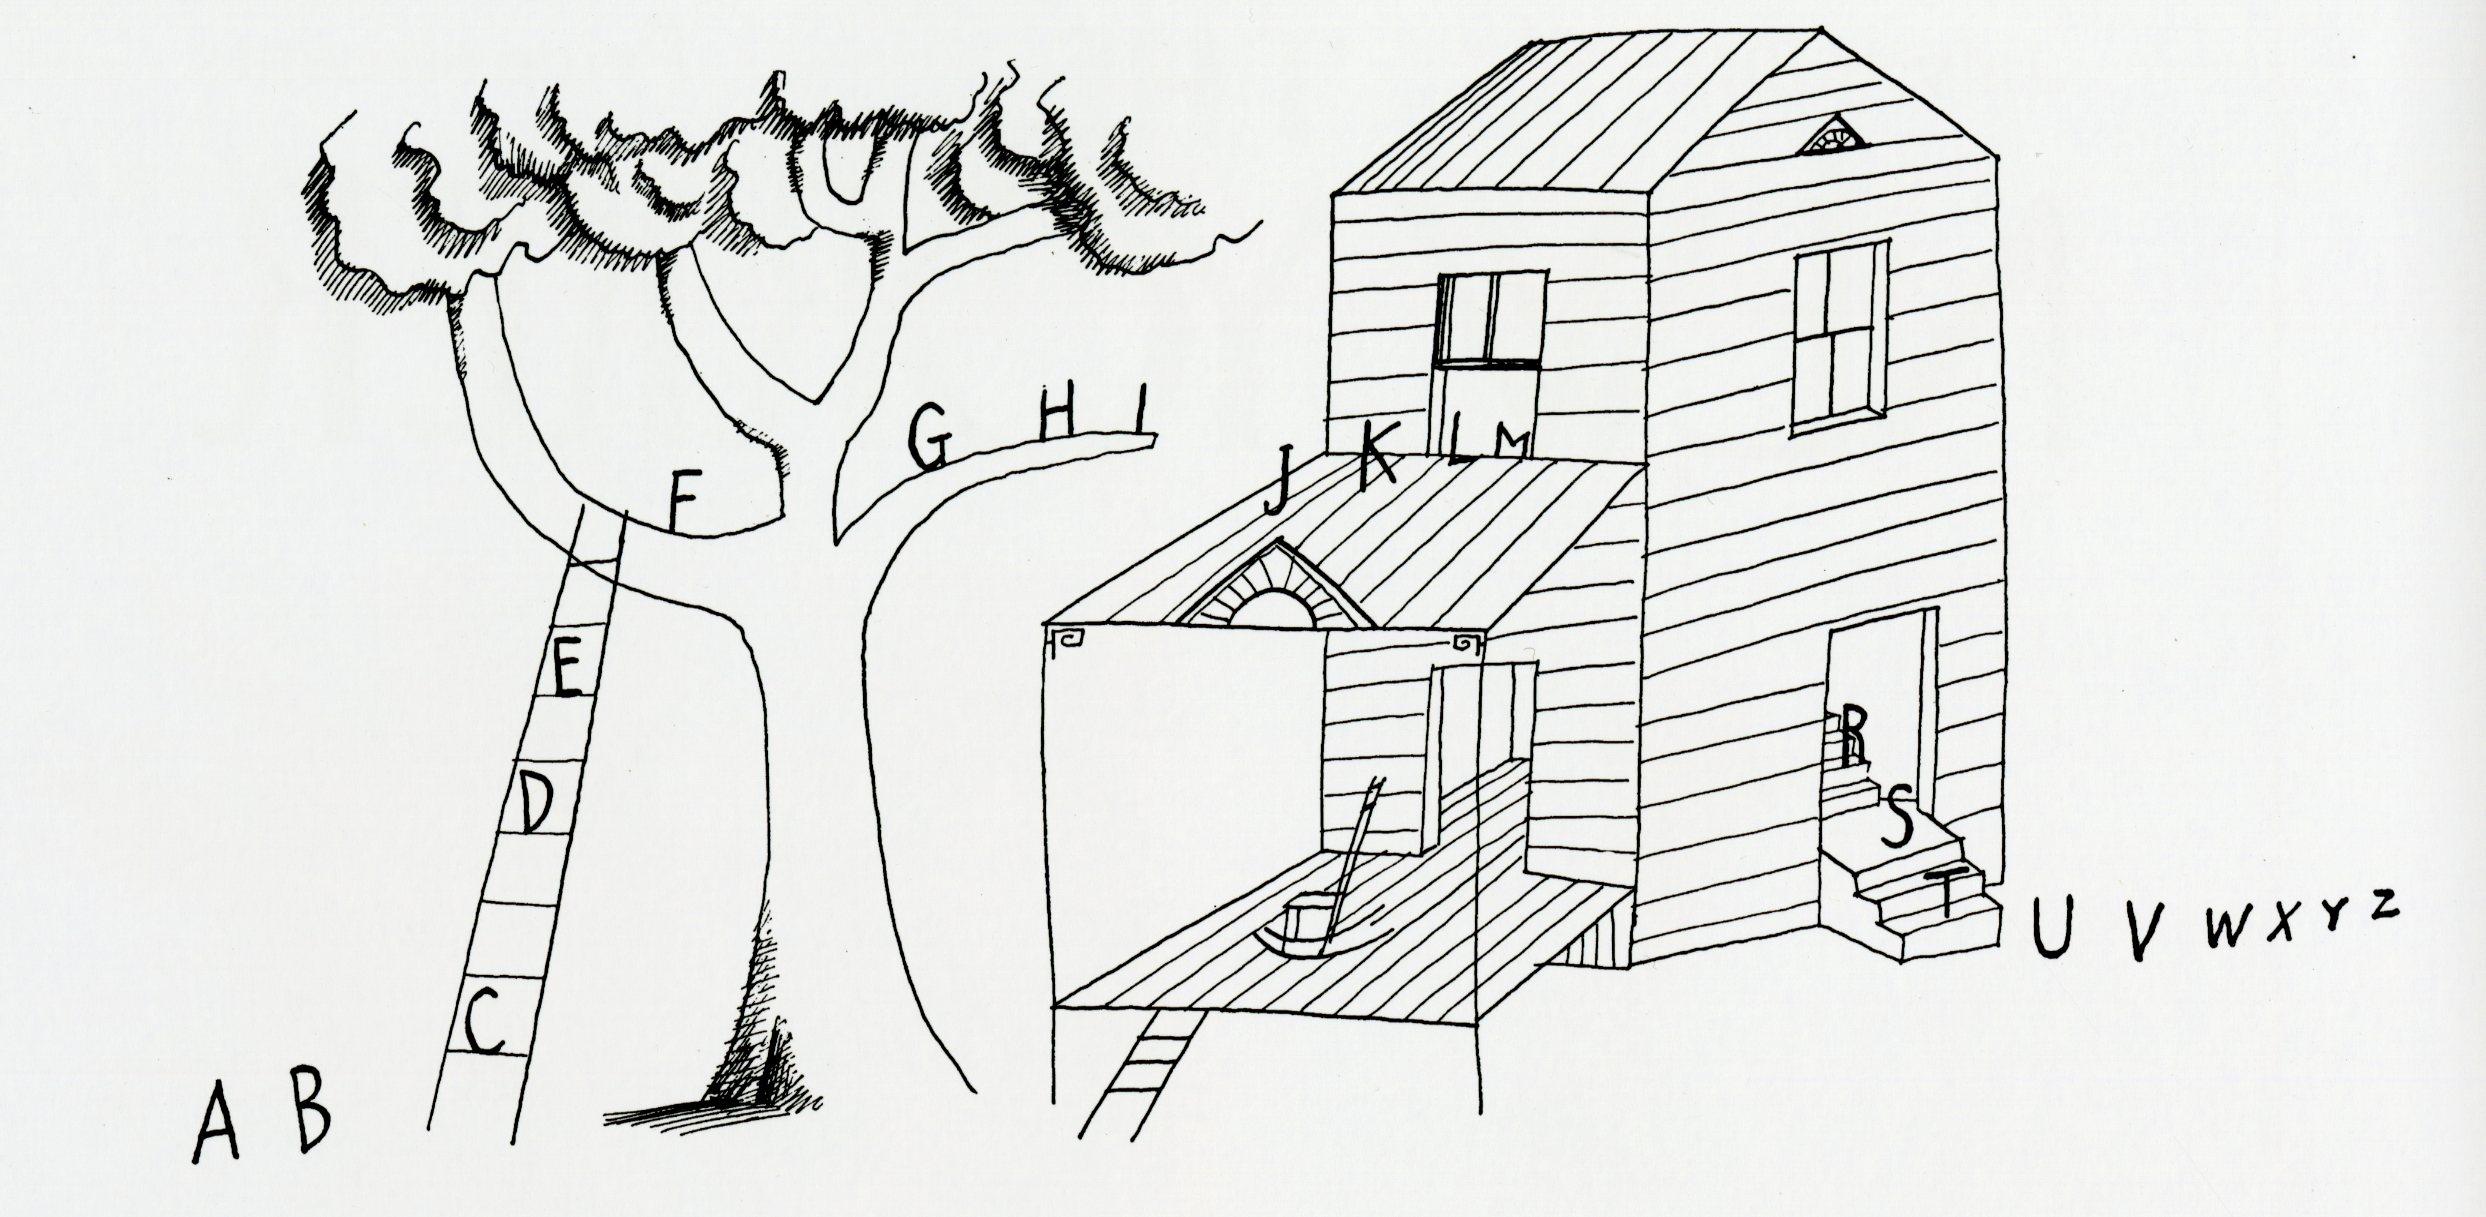 1000 images about saul steinberg palabras on pinterest. Black Bedroom Furniture Sets. Home Design Ideas